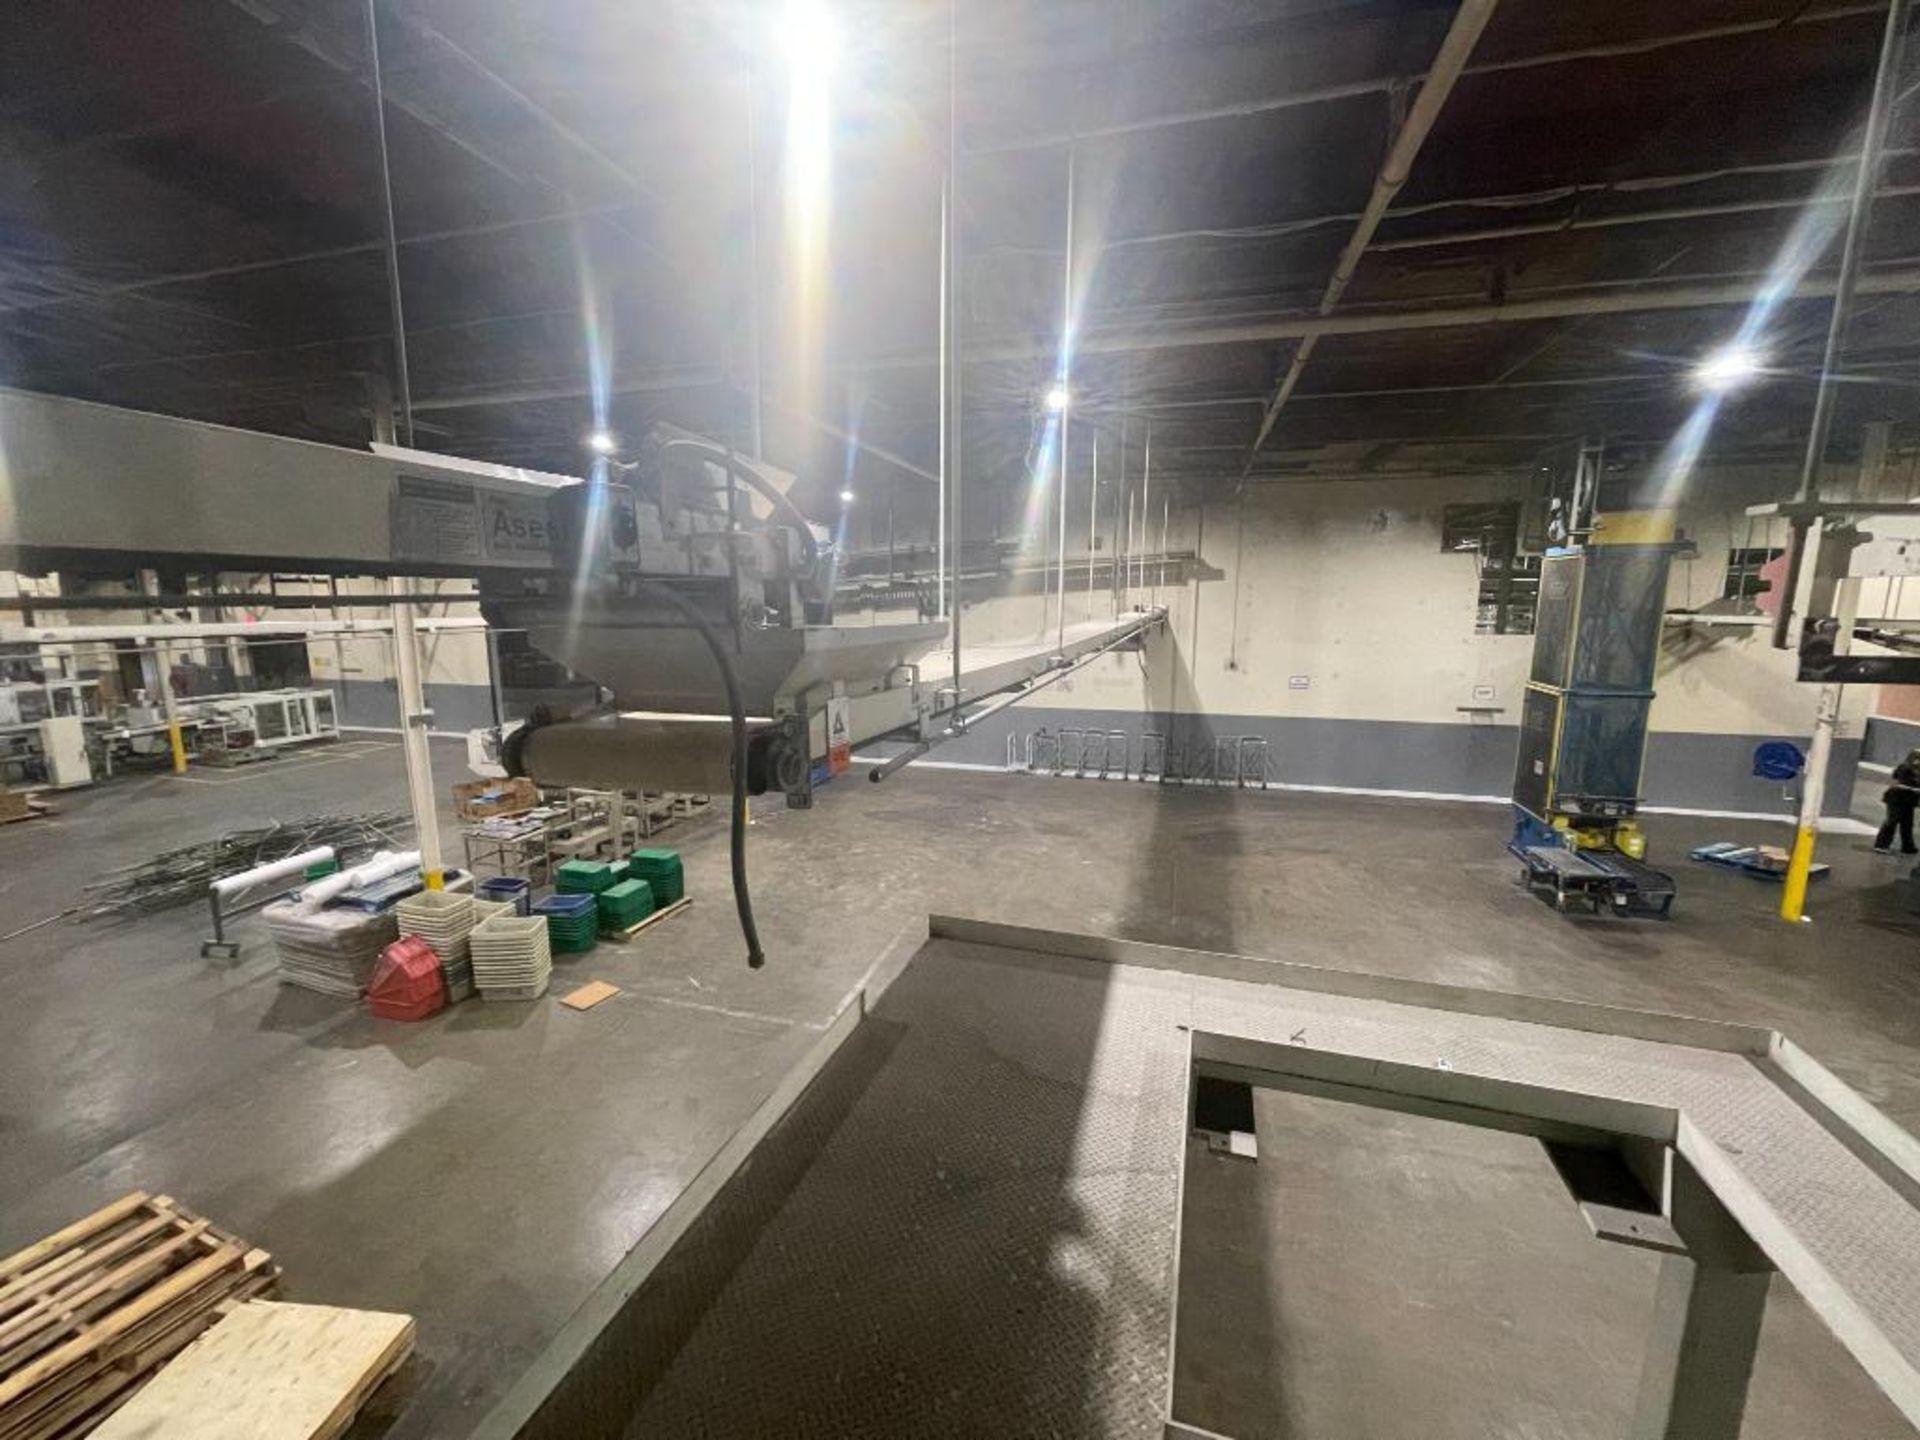 4 Aseeco mild steel conveyors